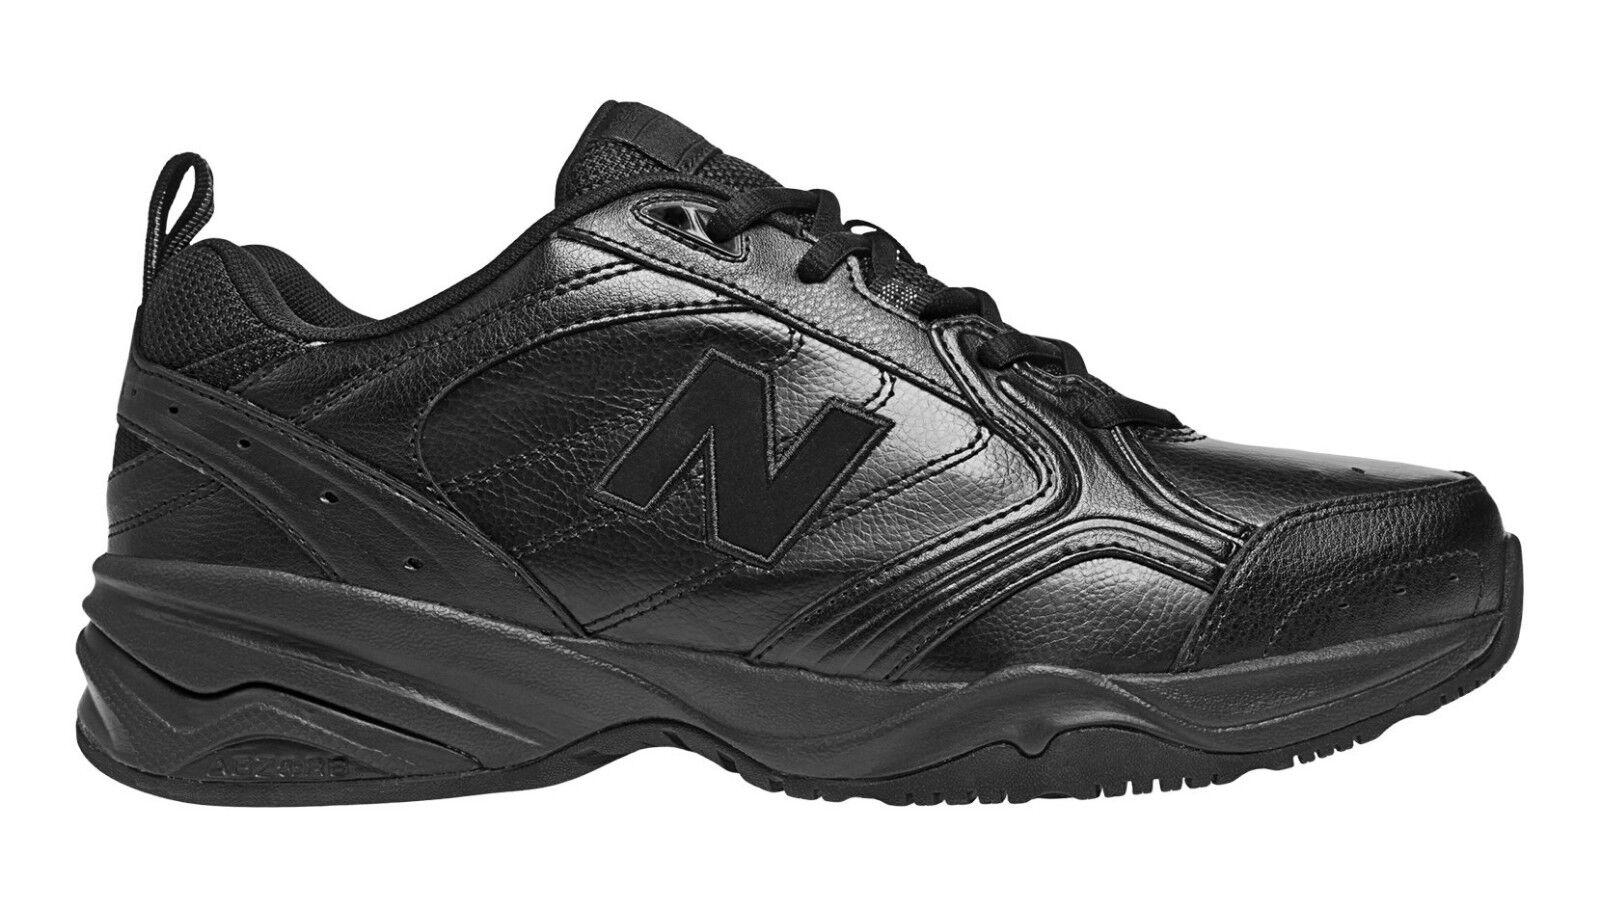 New Balance MX624AB2 Men's 624 Black Leather Trainer Cross-Training shoes